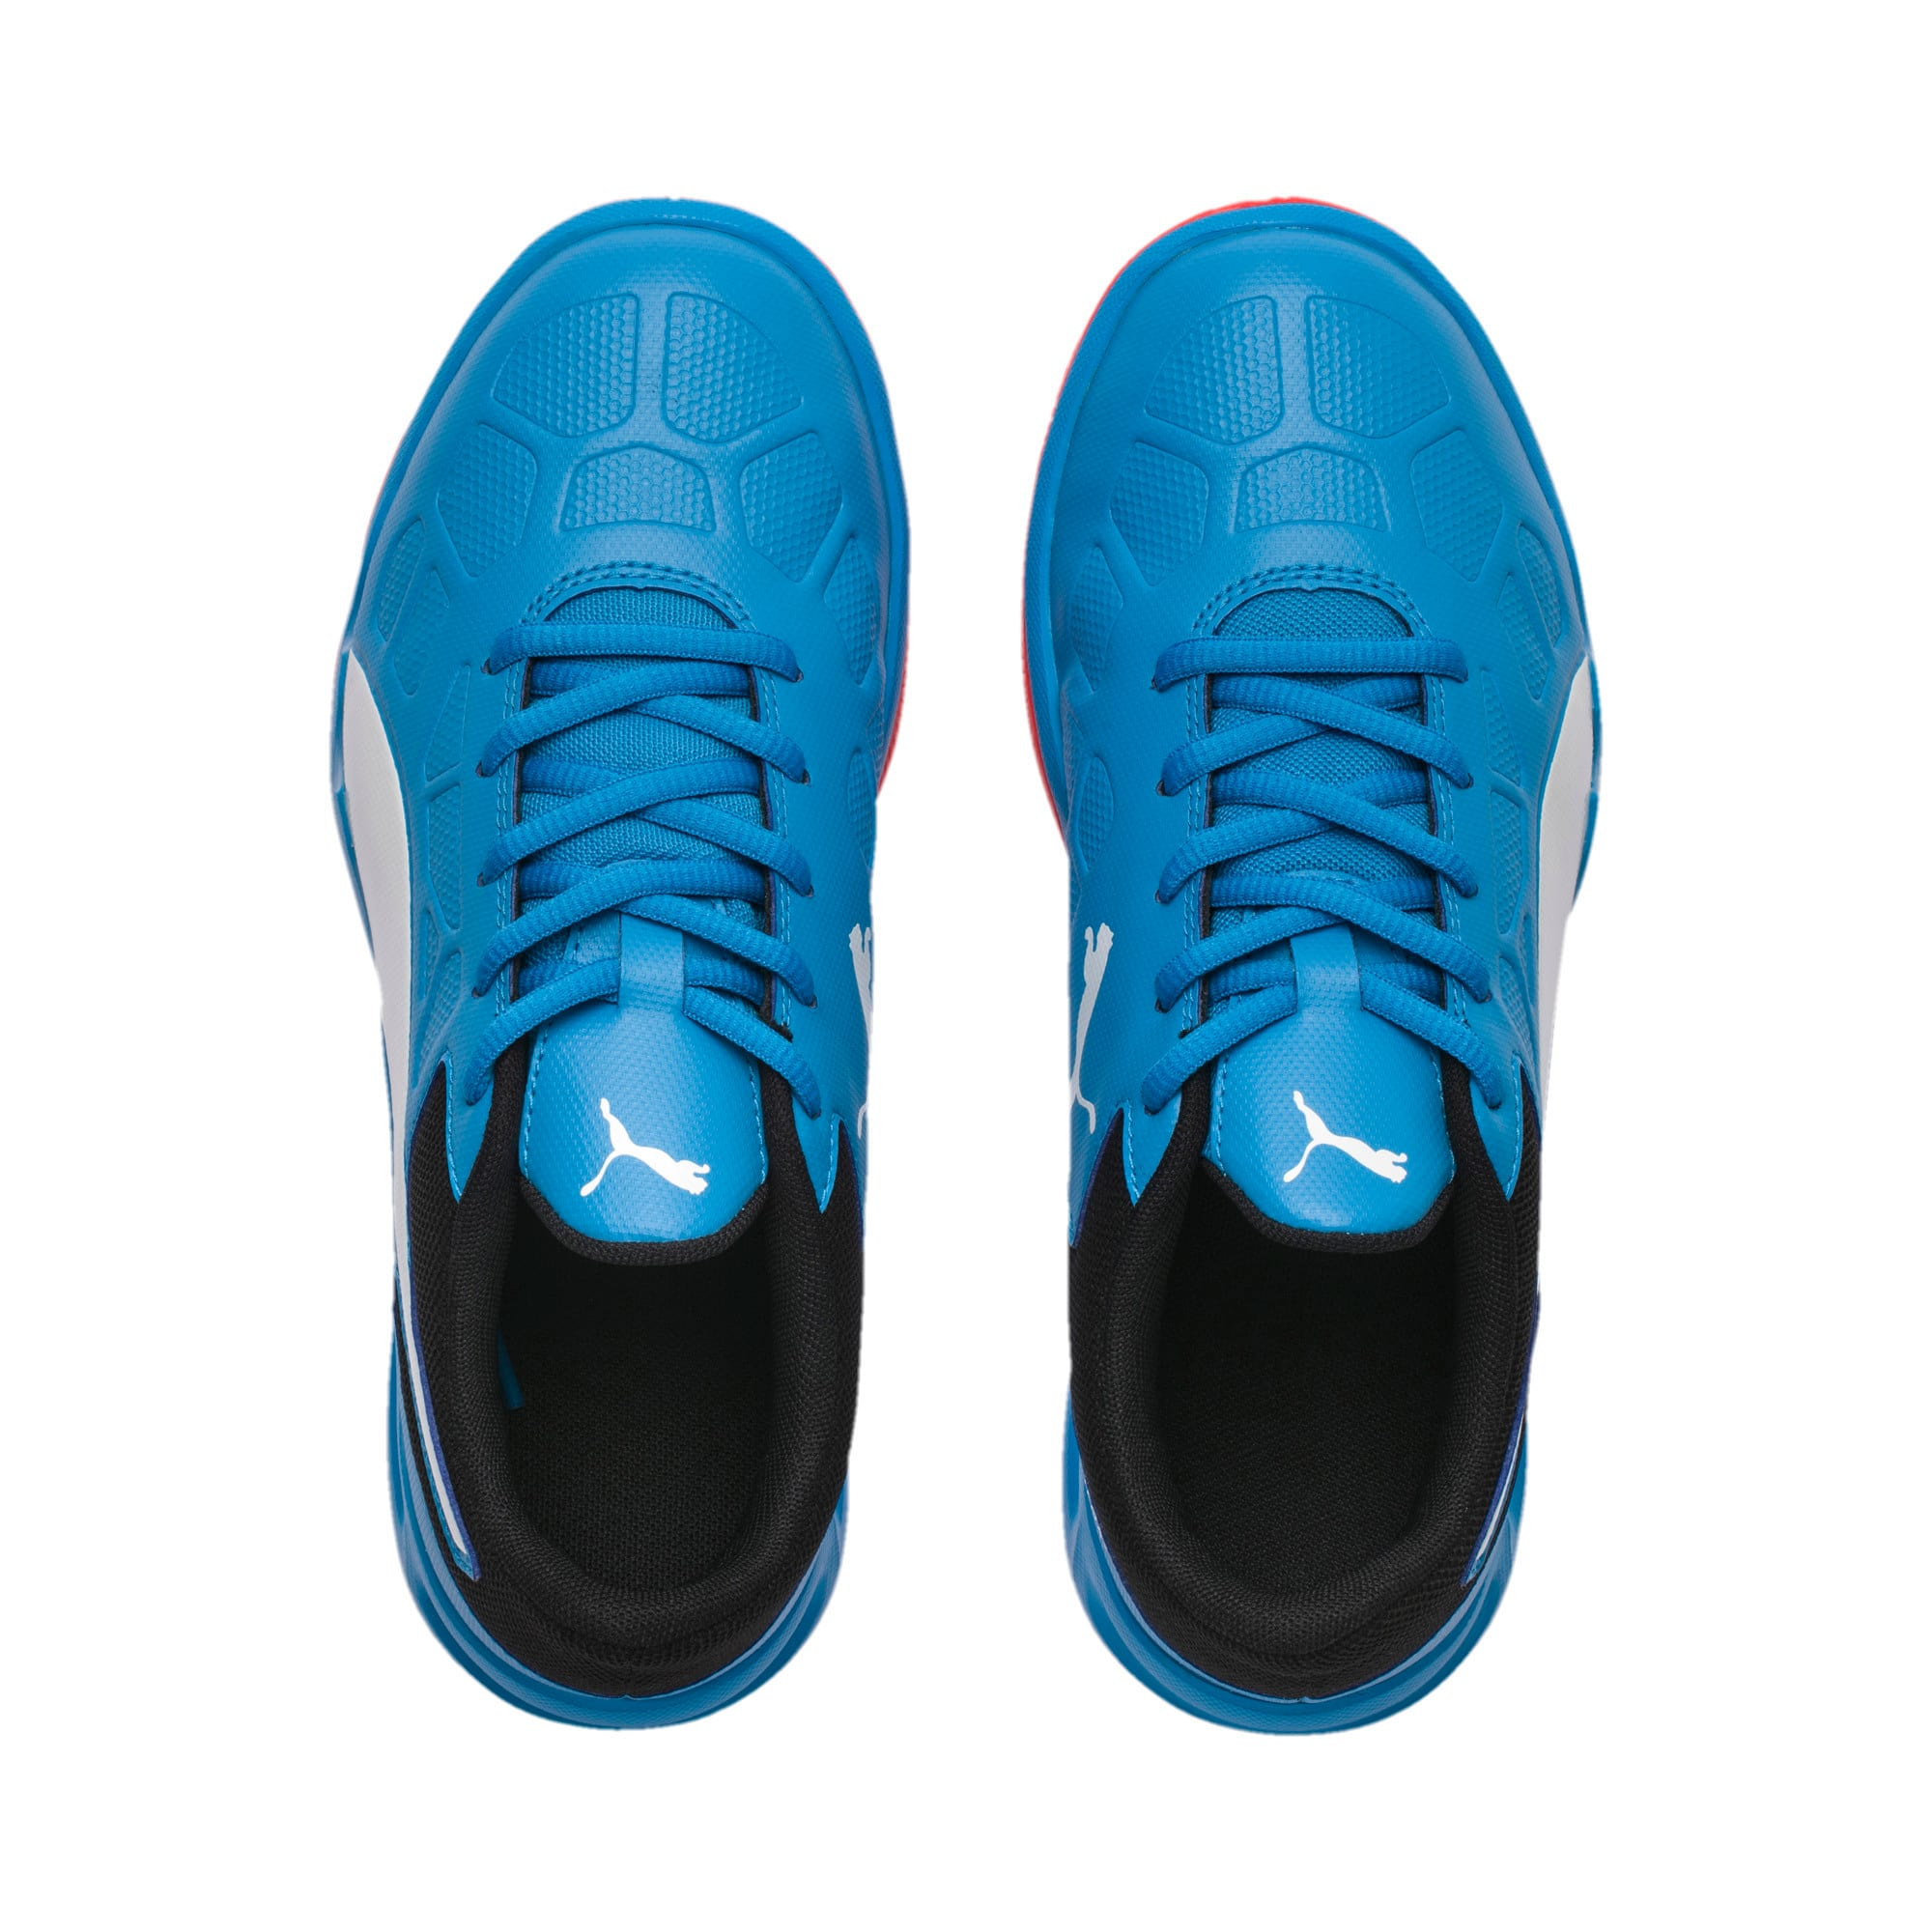 Thumbnail 2 of Tenaz Kids' Indoor Teamsport Shoes, Bleu Azur-White-Black-Red, medium-IND